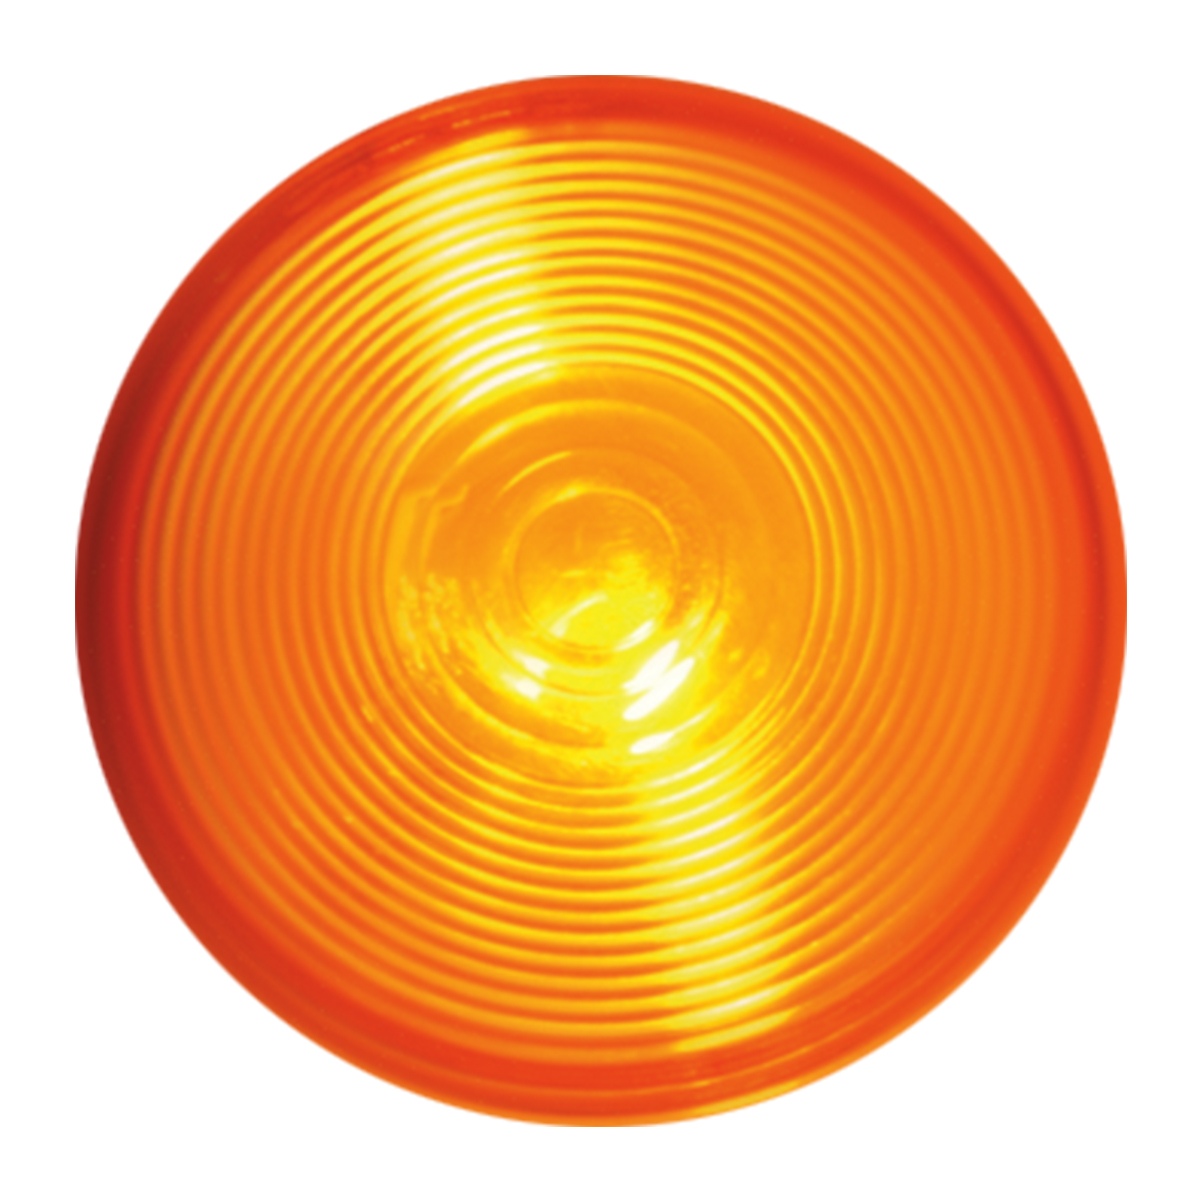 "#80476 4"" Round Incandescent Flat Amber/Amber Light"